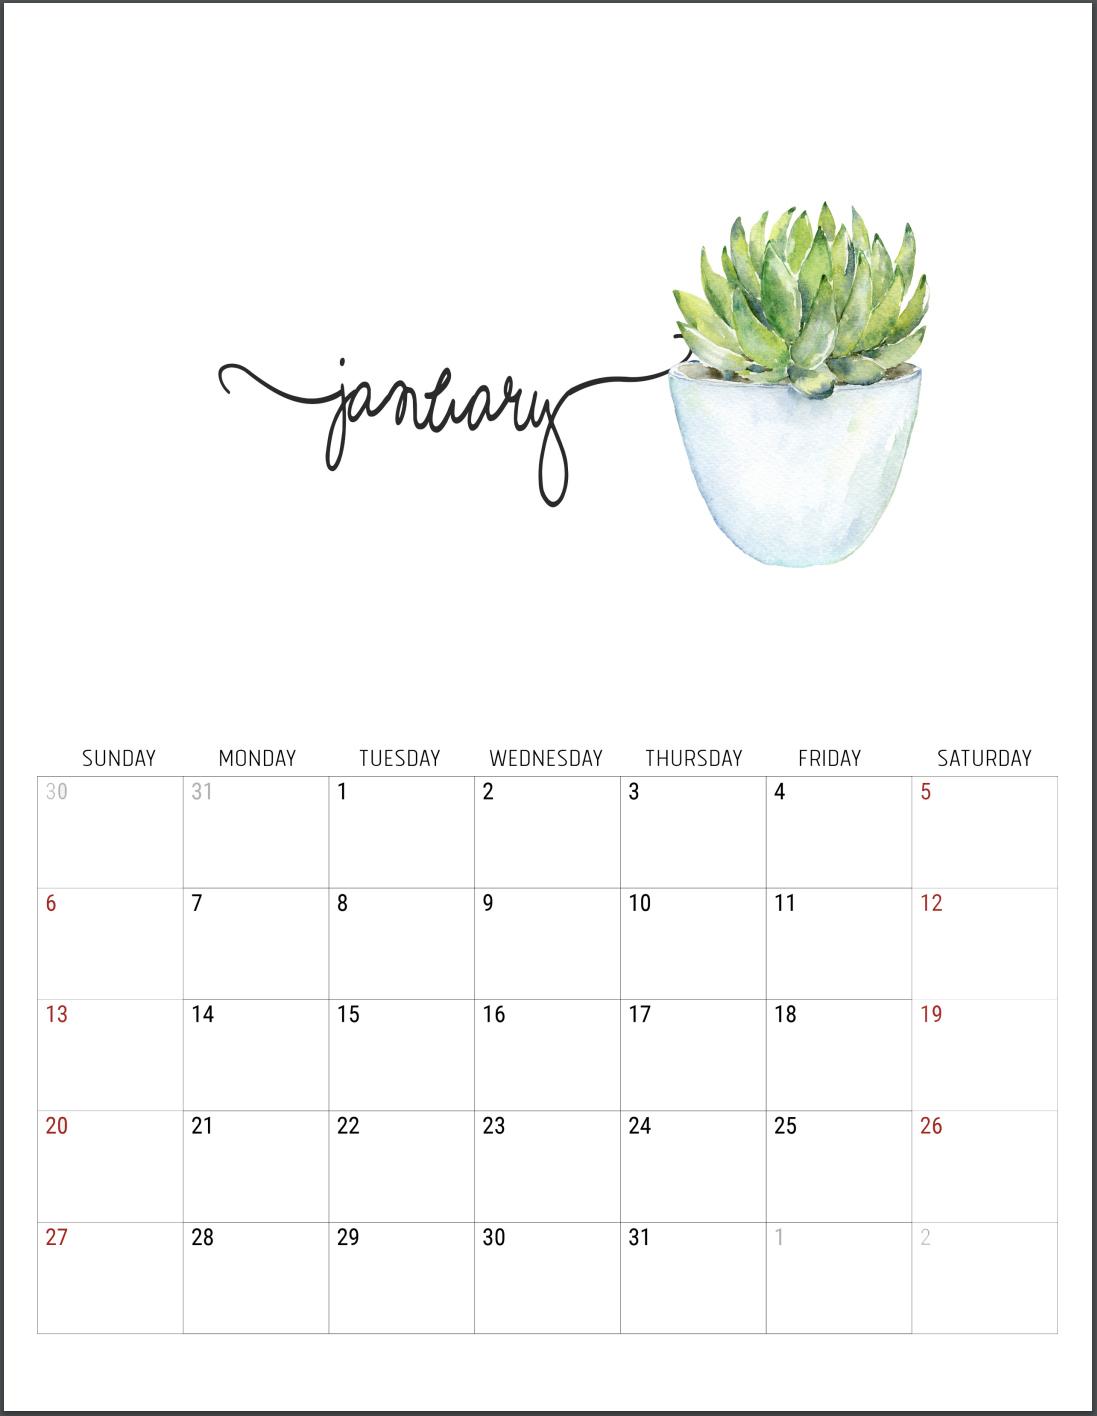 2019 Free Printable Calendars - Lolly Jane with regard to Decorative Printable Calendar Templates